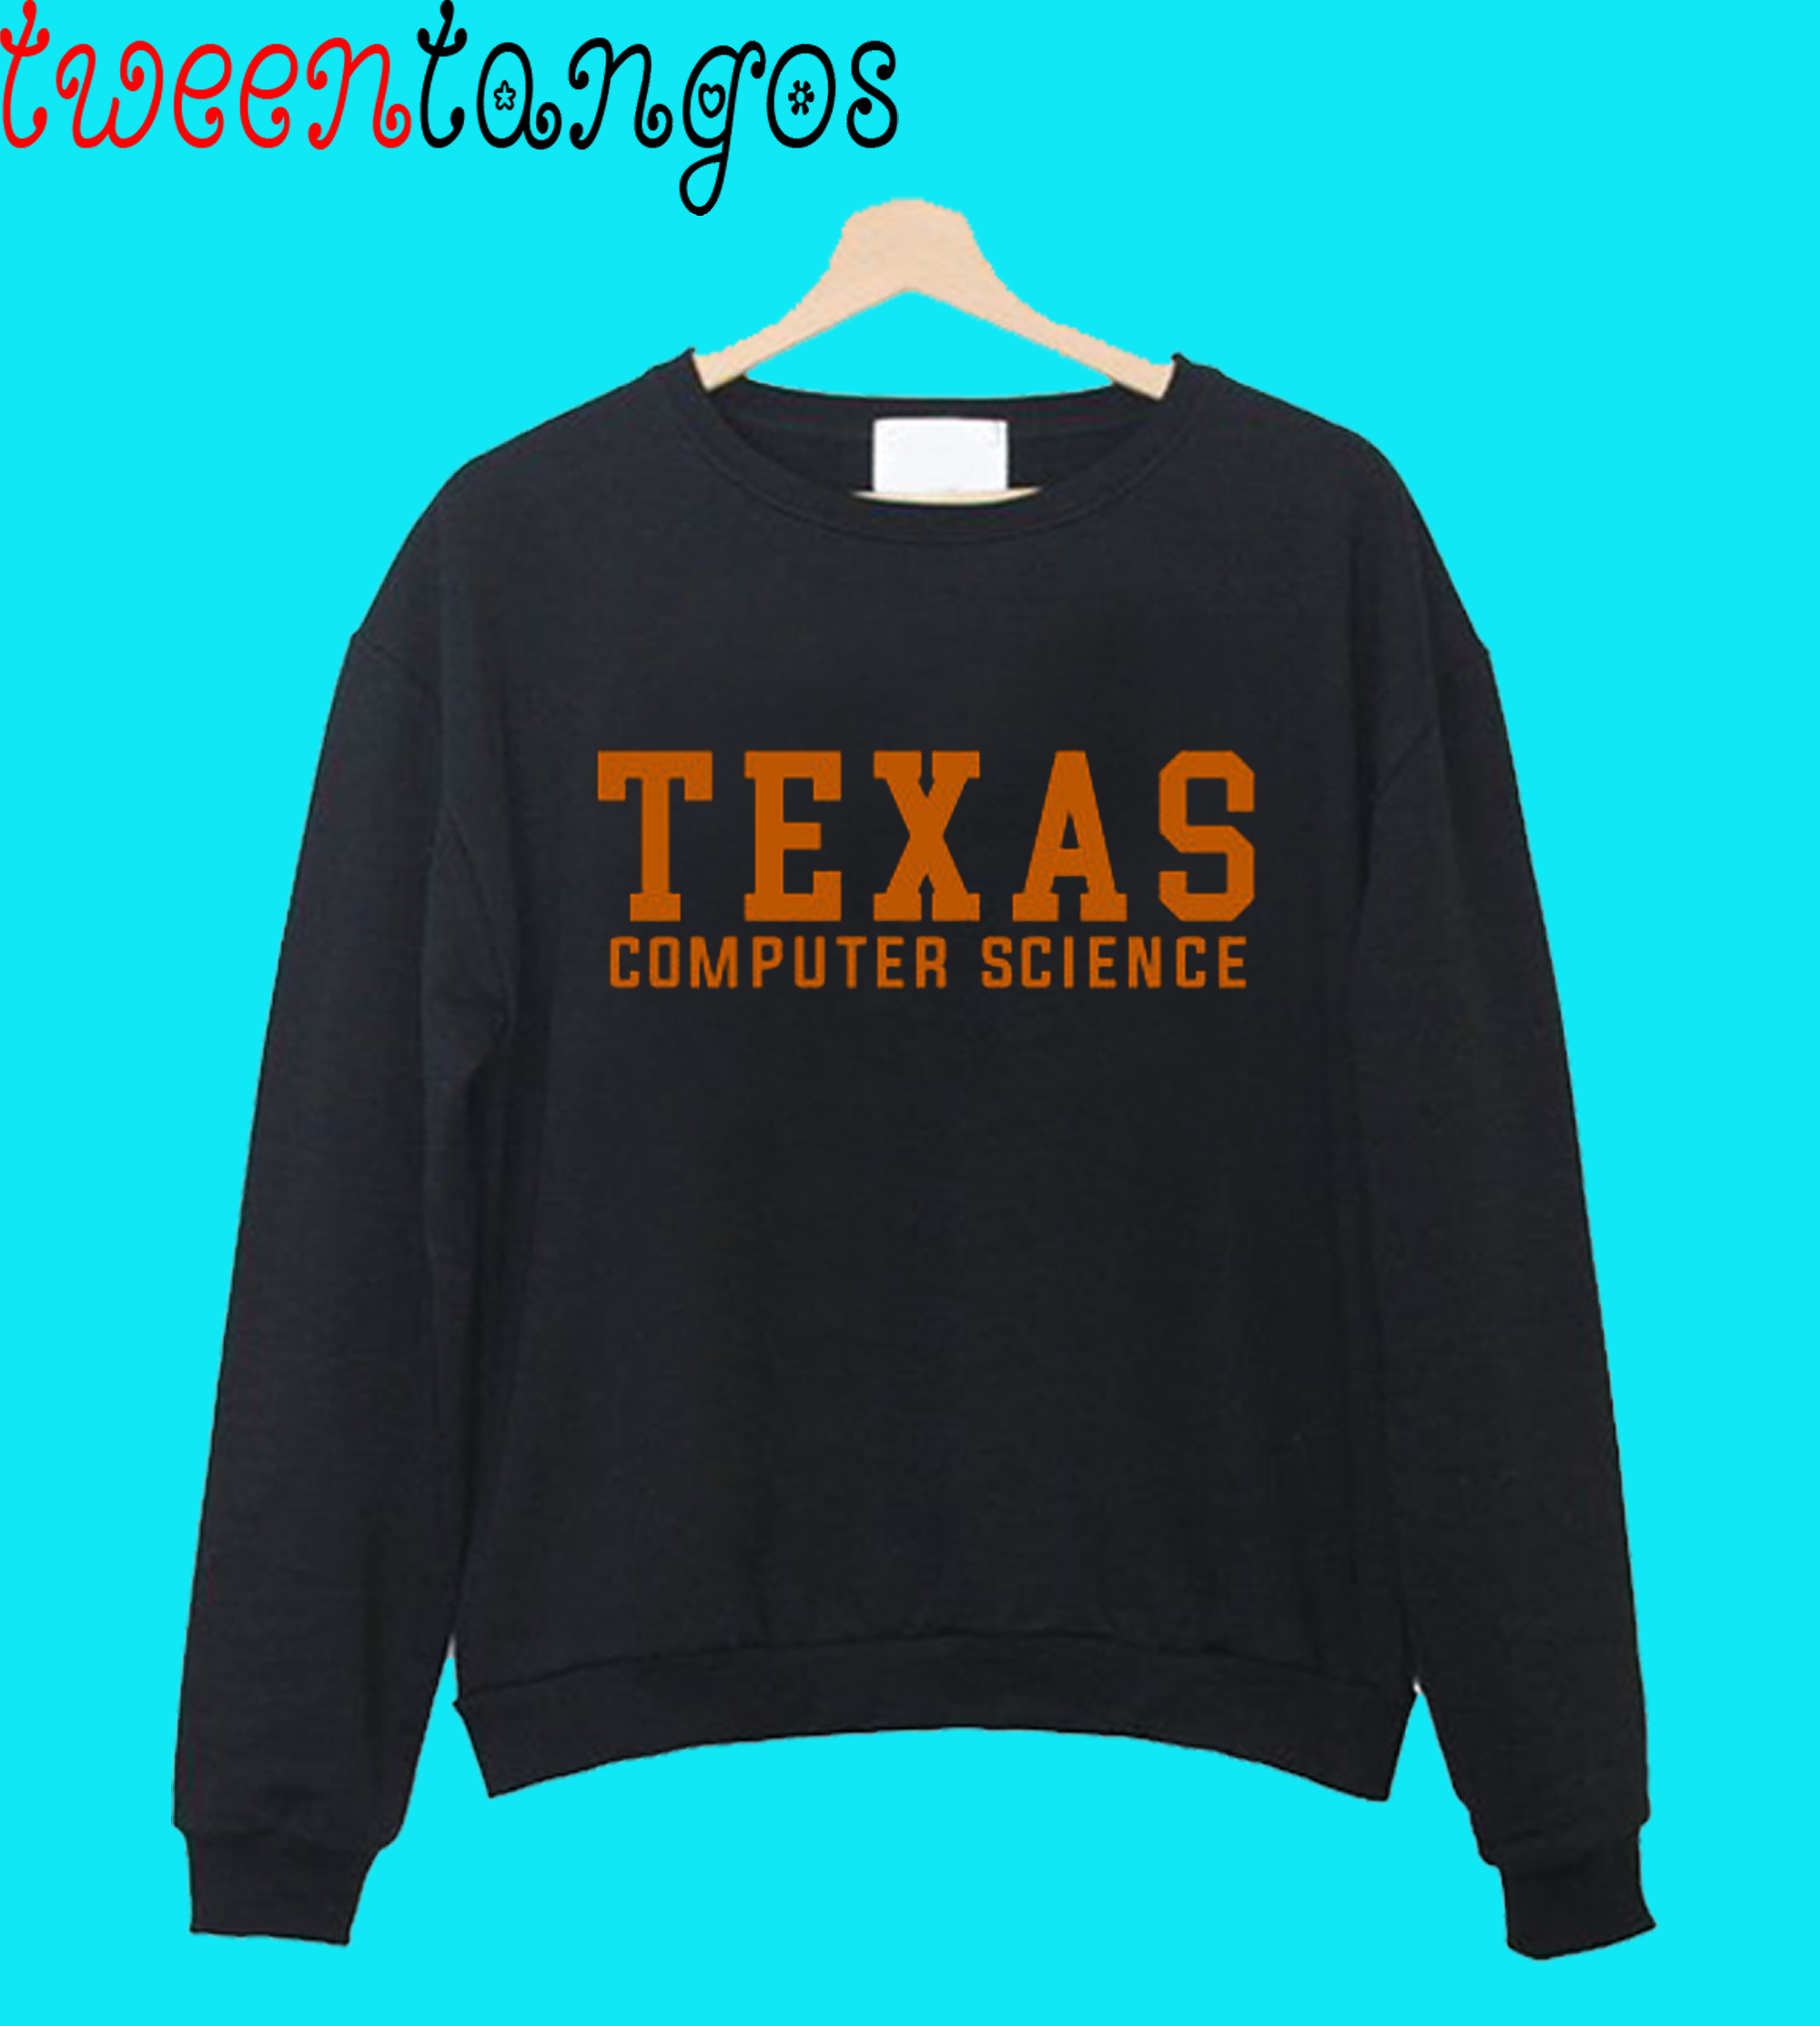 Texas Computer Science (Burnt Orange) Crewneck Sweatshirt